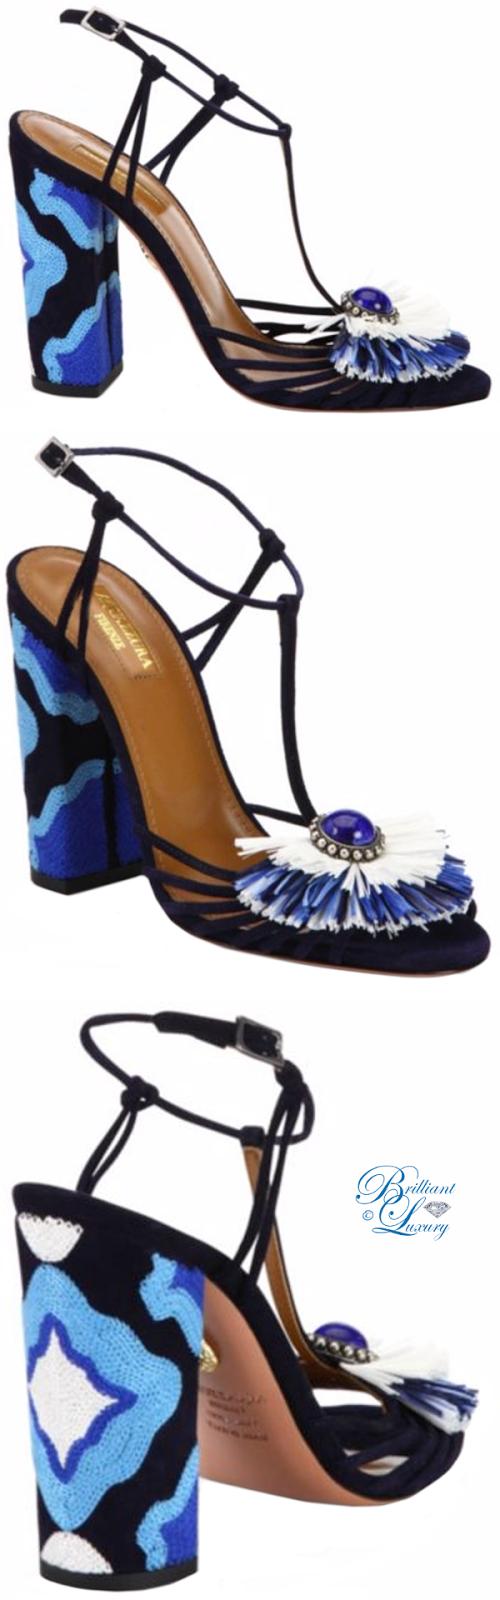 Brilliant Luxury ♦ Aquazzura Samba Embellished Suede Block Heel Sandals